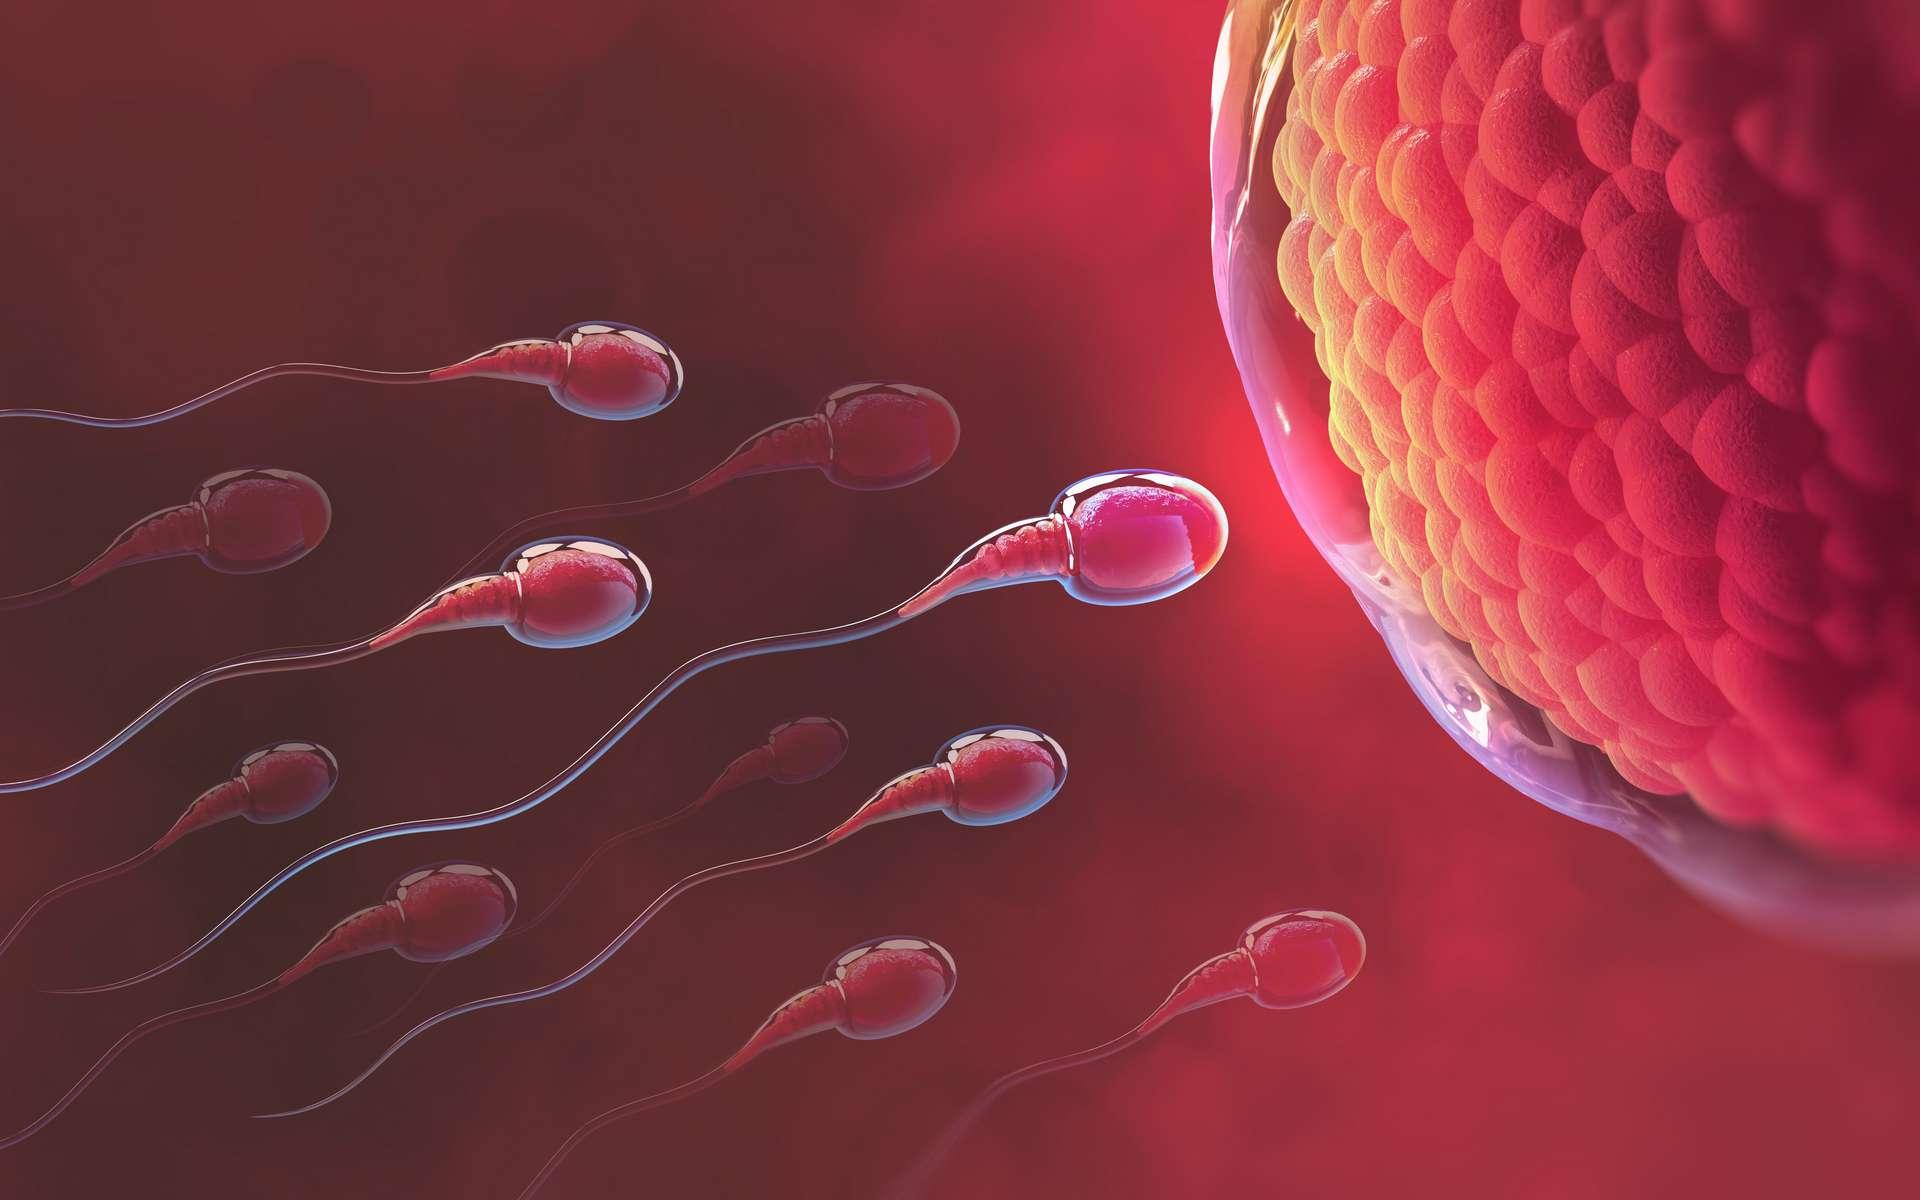 Le spermatozoïde gagnant avait sans doute l'antidote - Futura